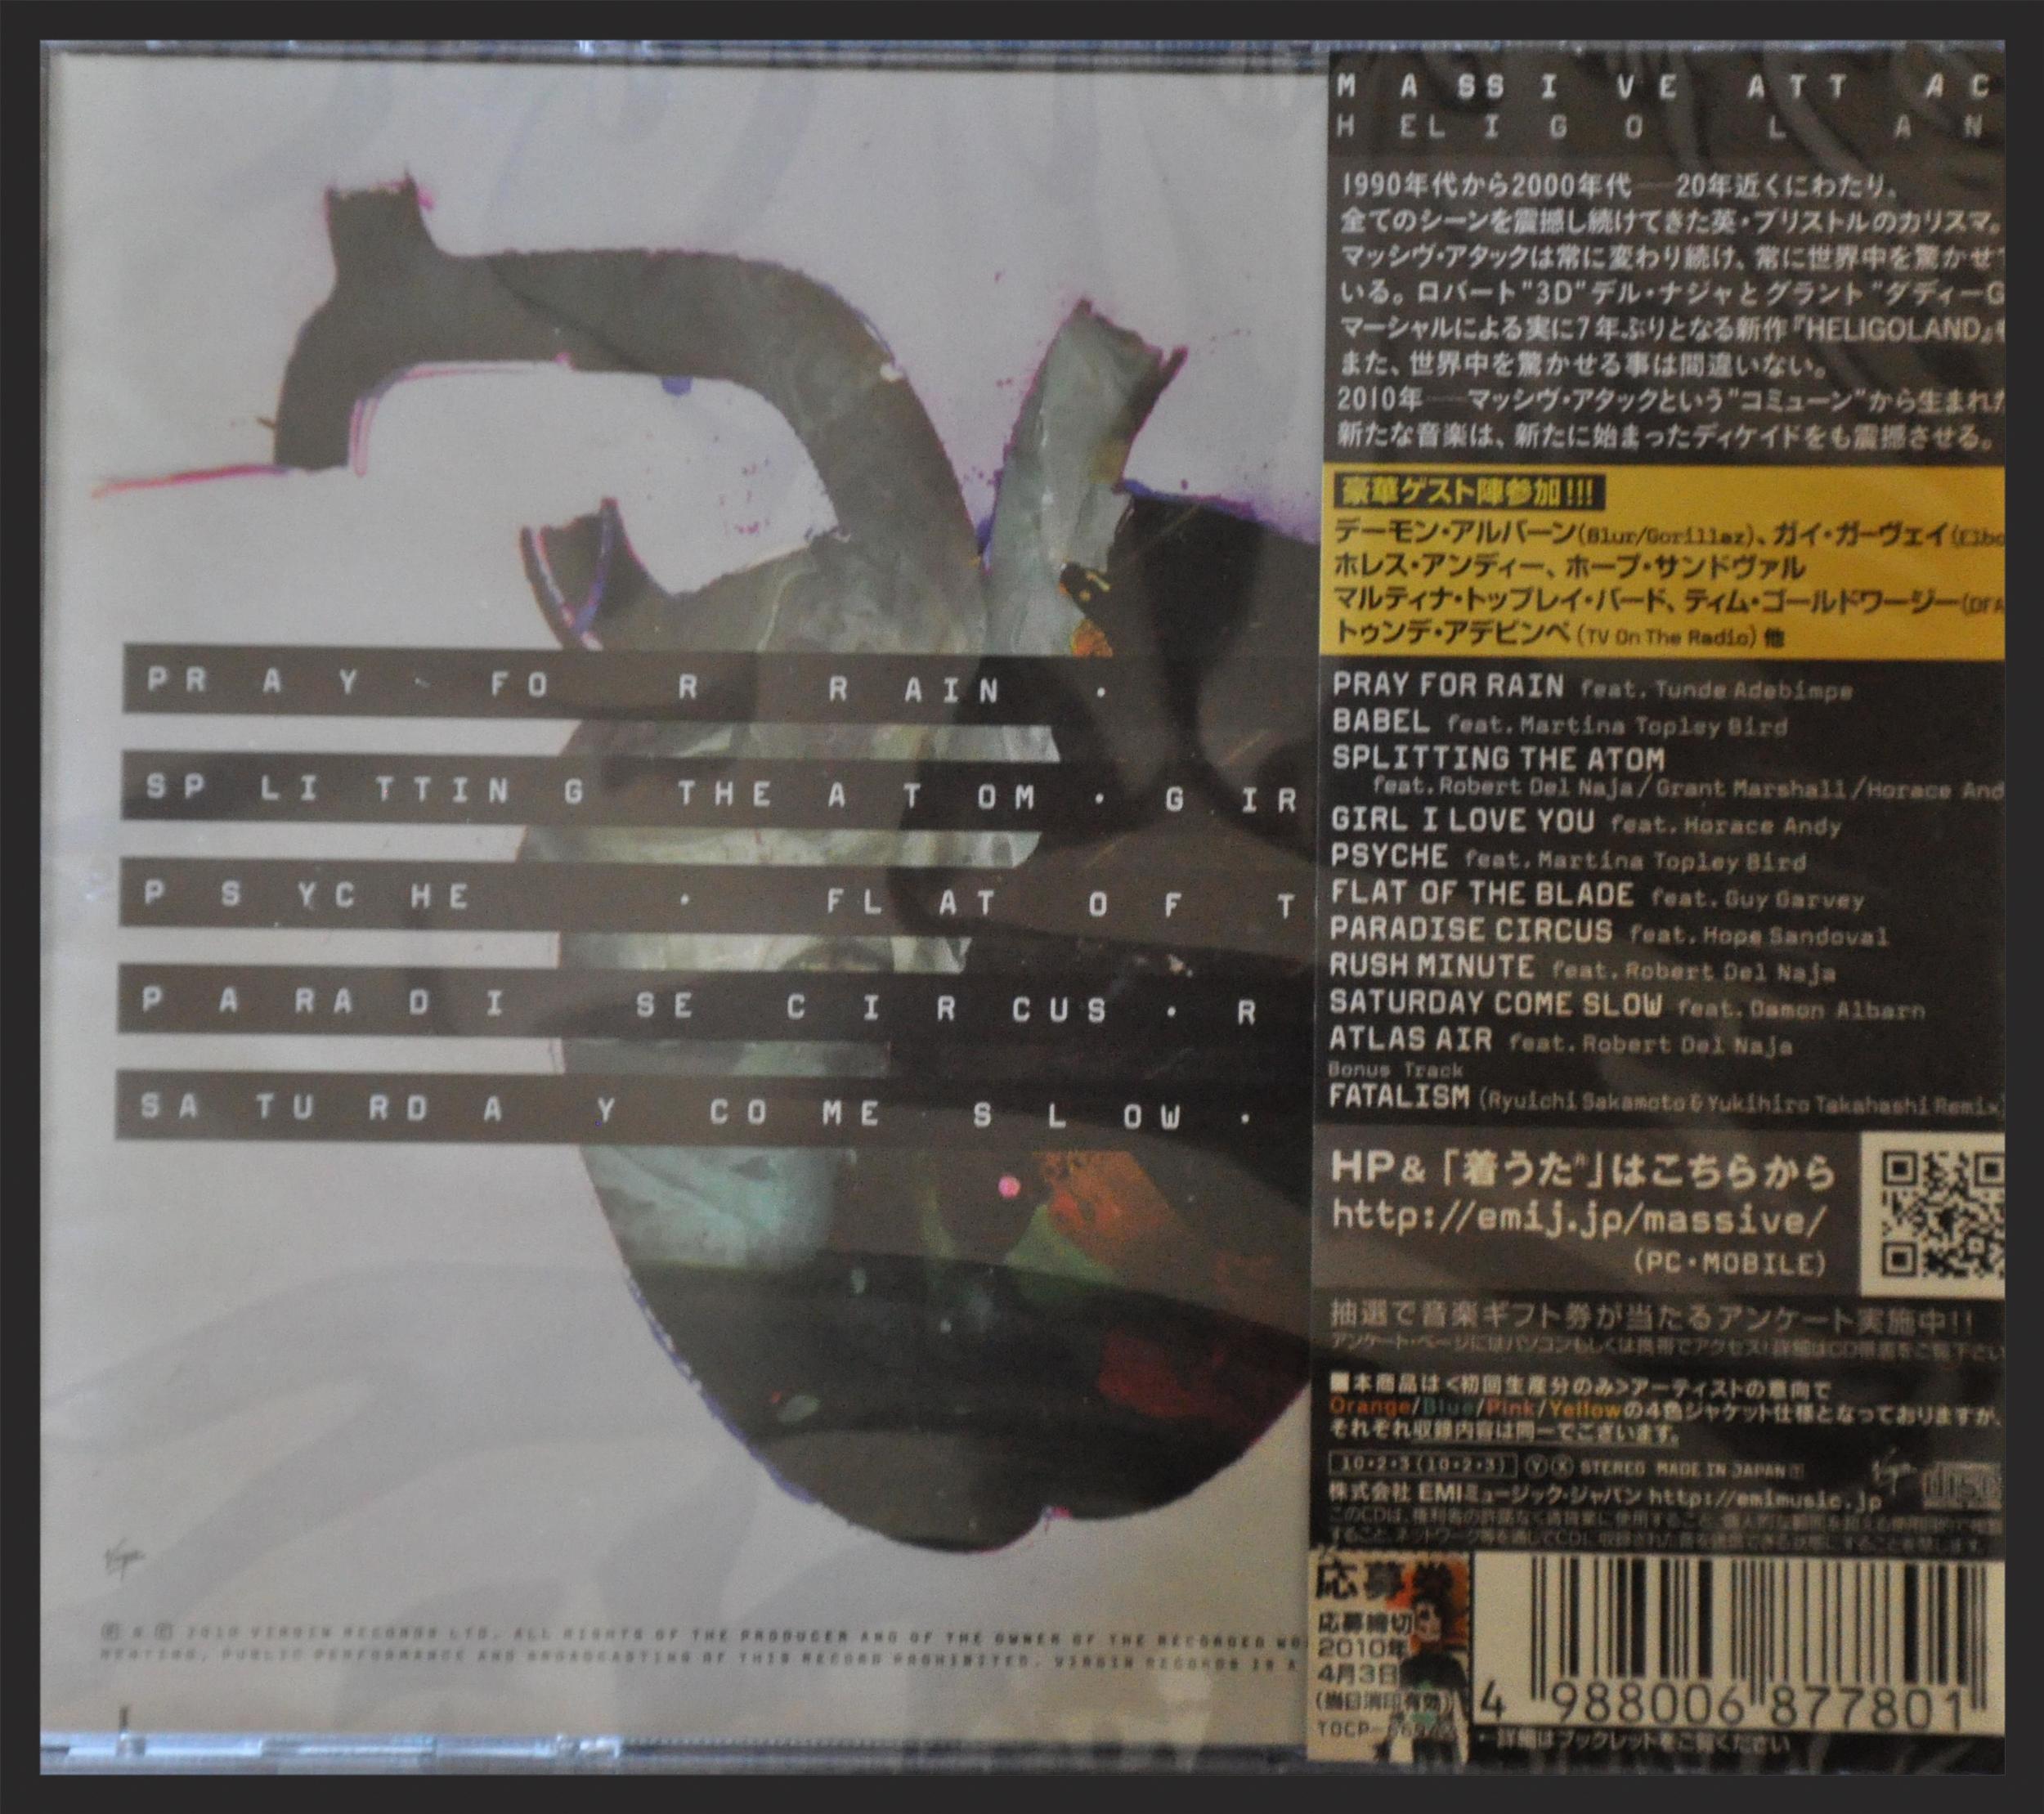 japaneseretailcd-1304338913.jpg